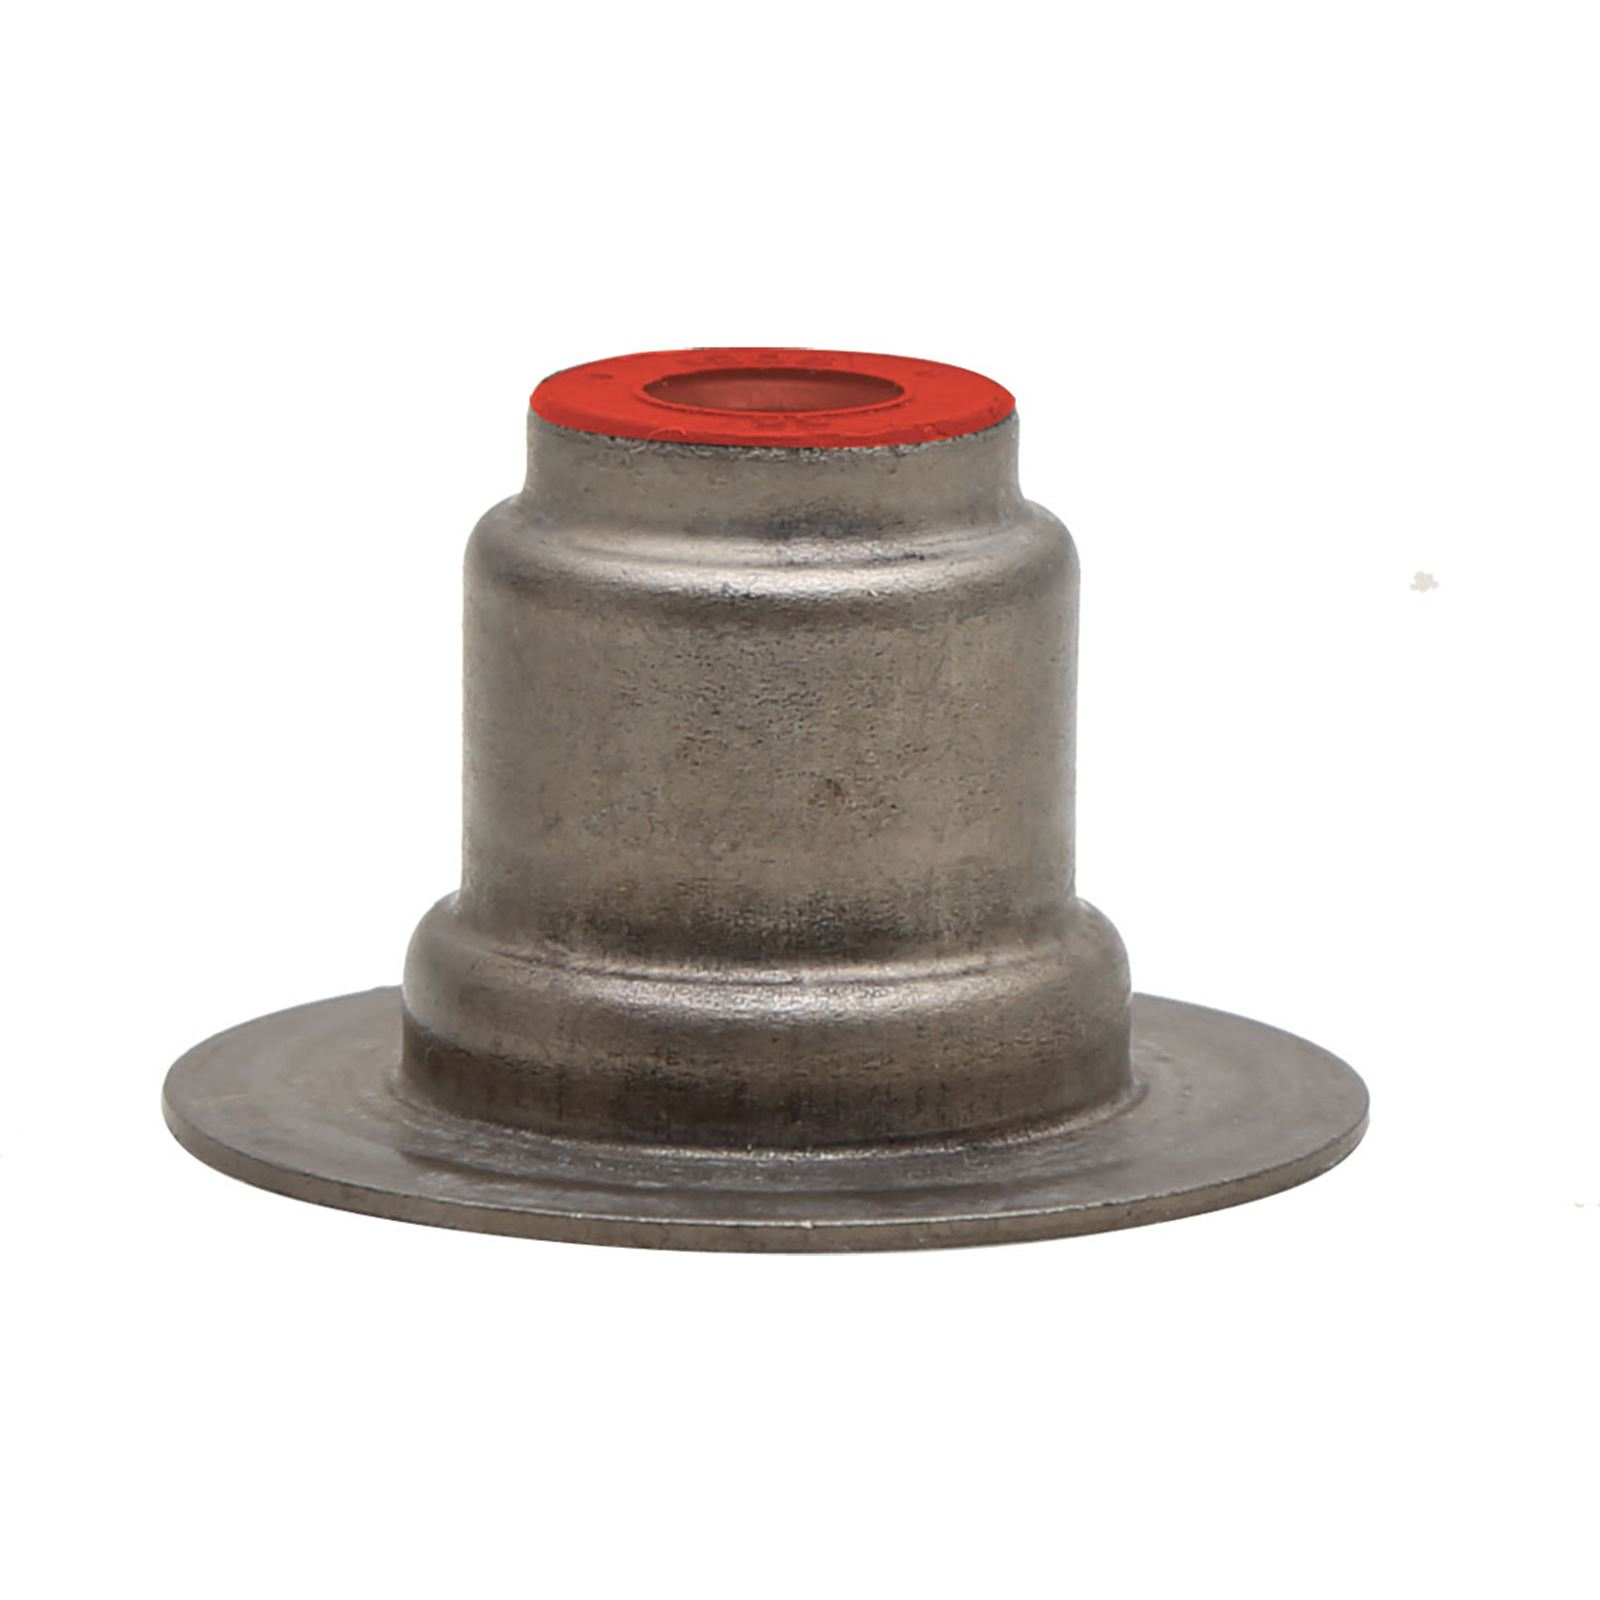 KPMI Valve Stem Seal